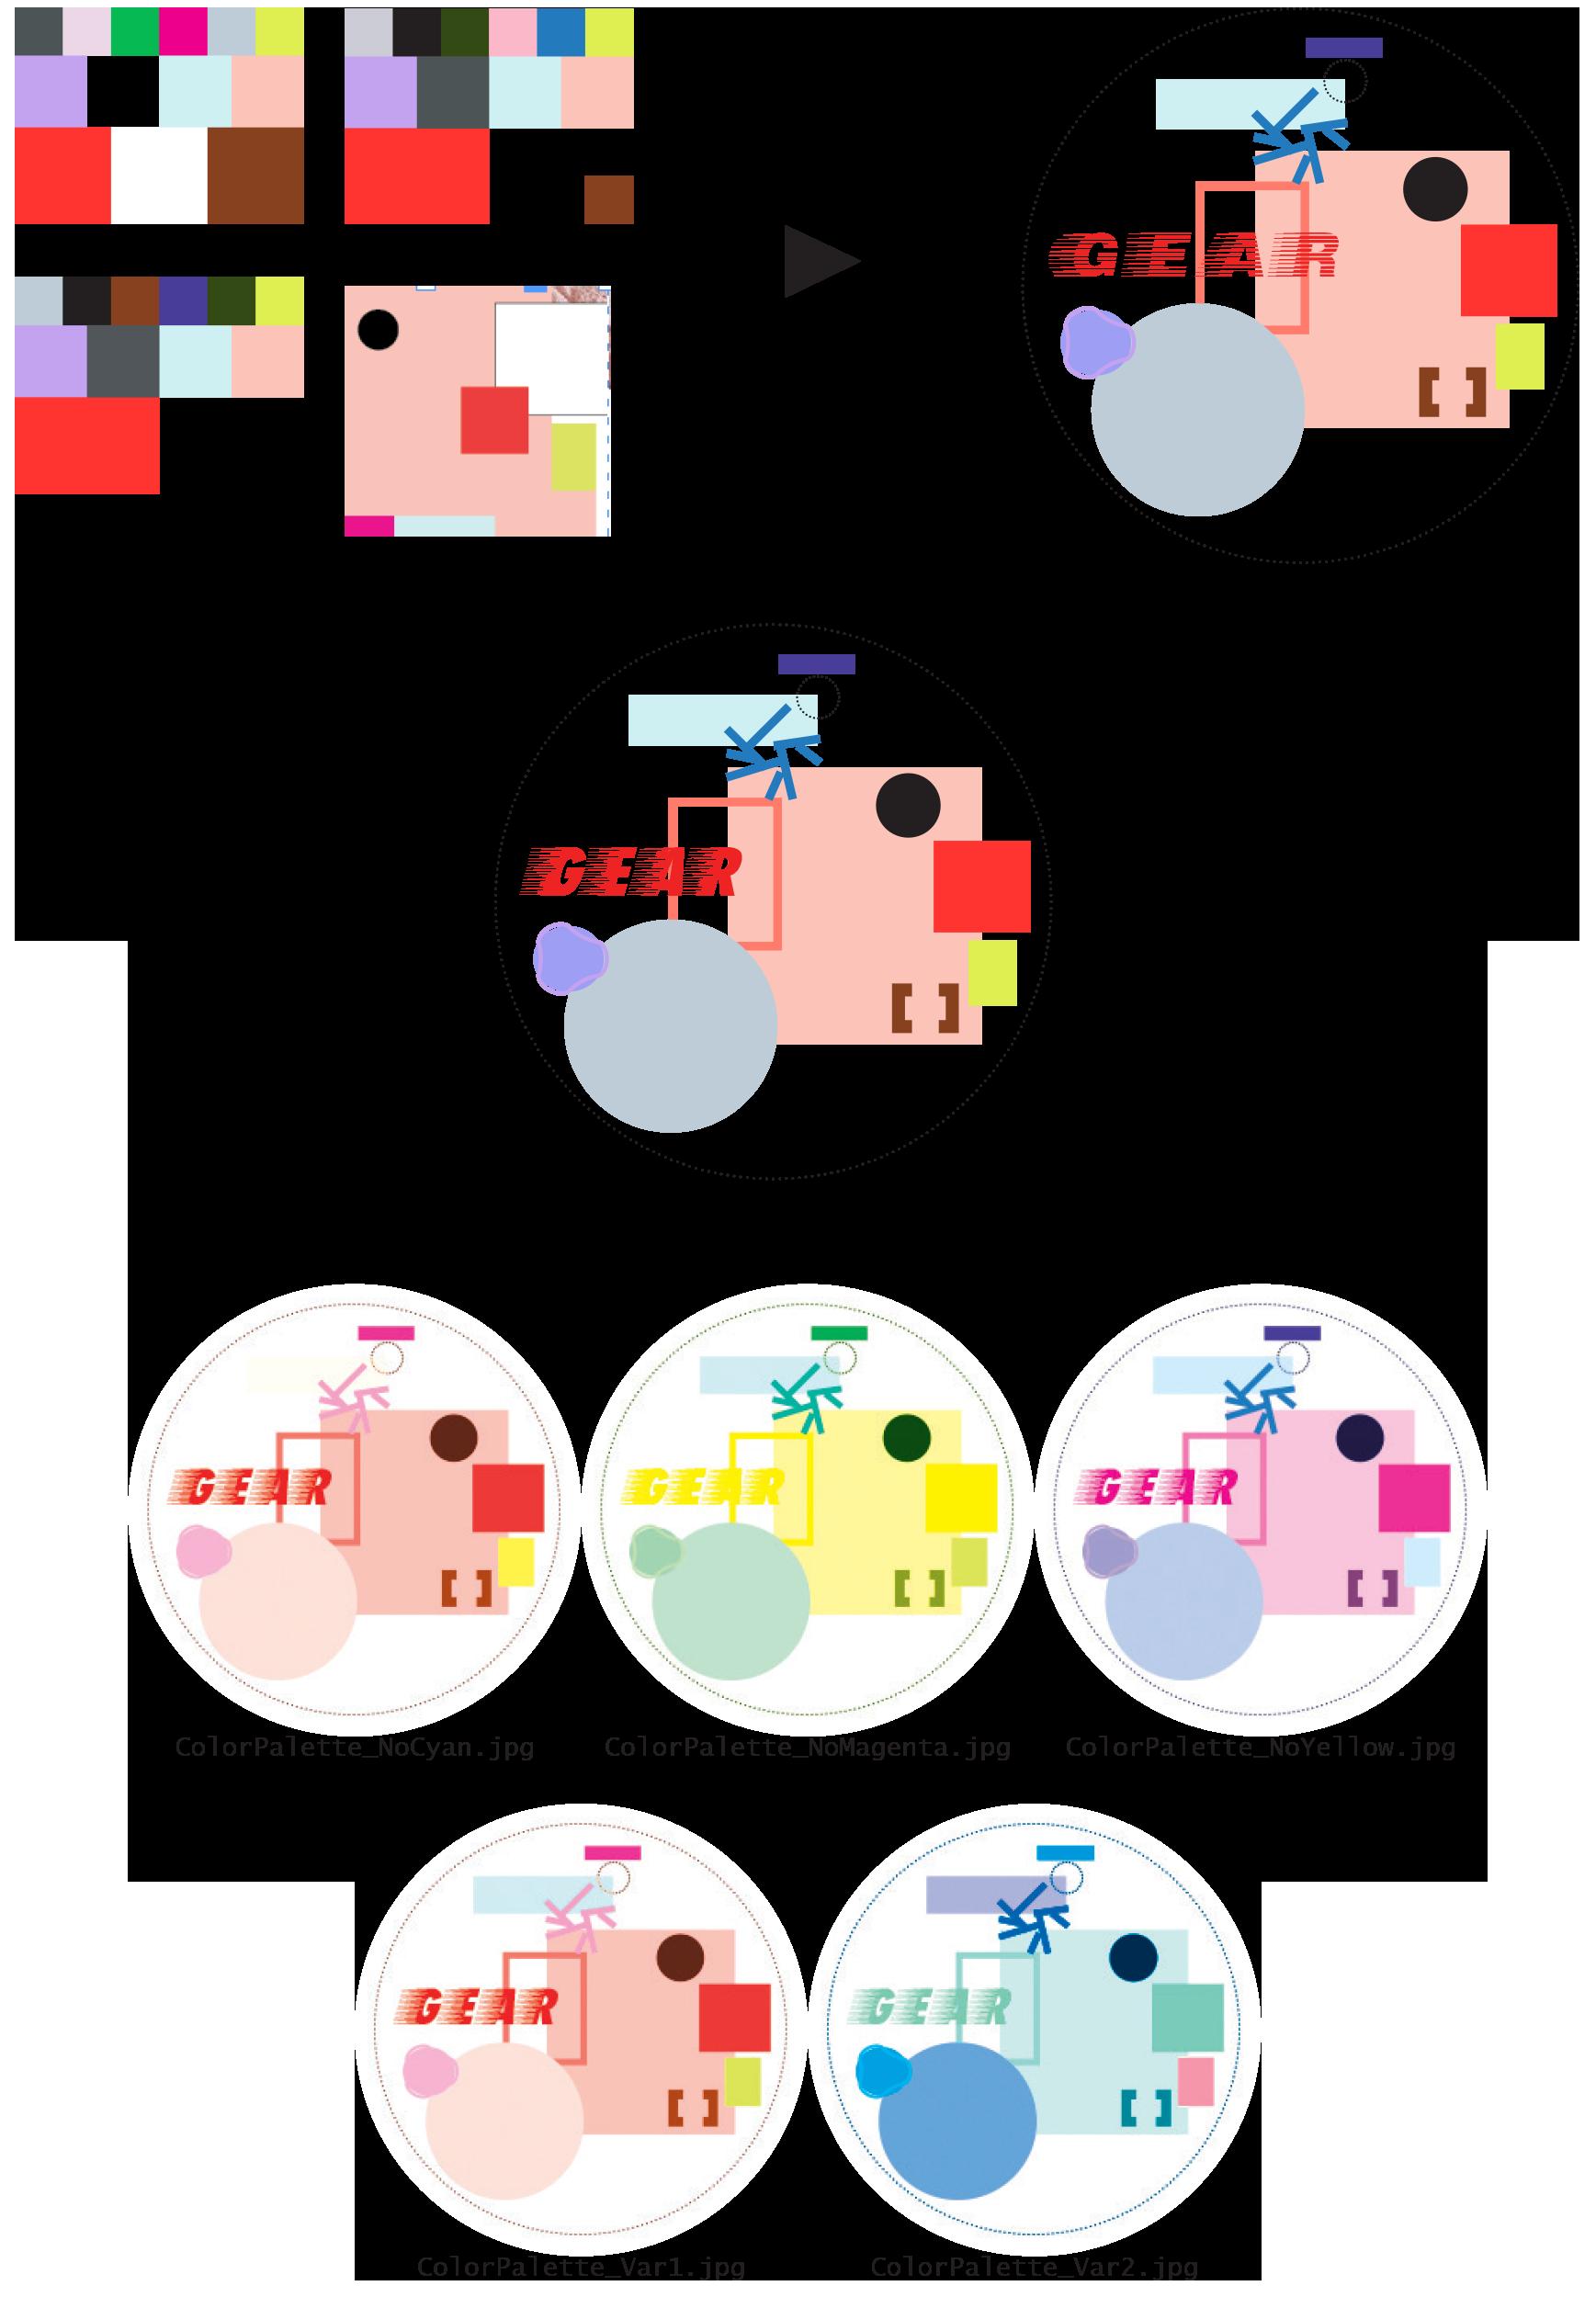 development of the color palette